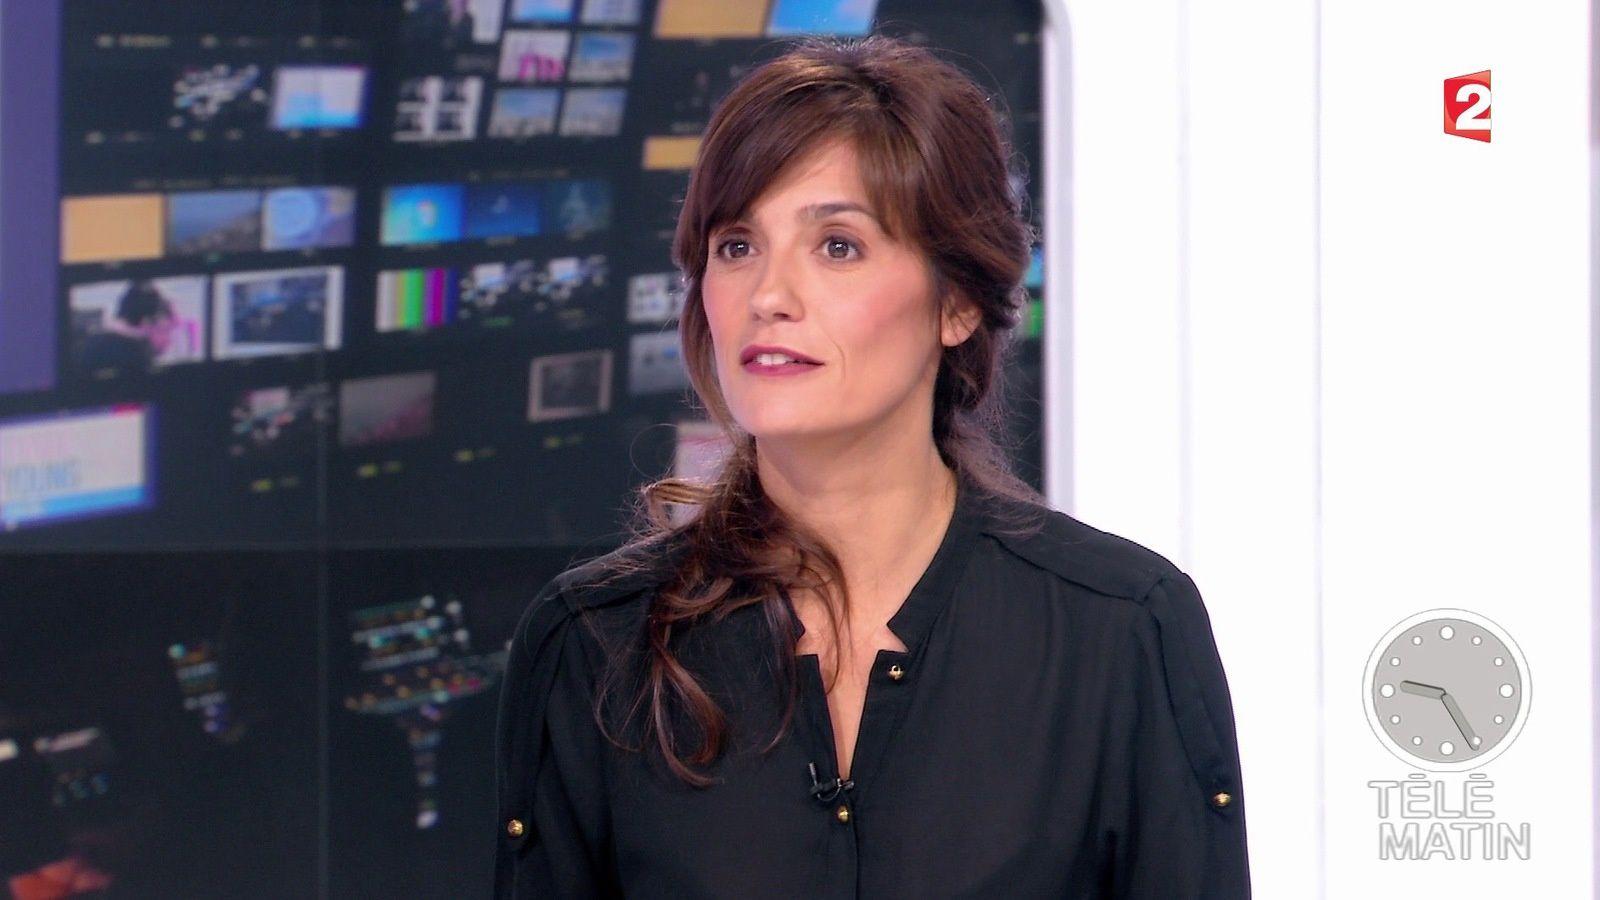 �6 TANIA YOUNG @telematin @France2tv ce matin #vuesalatele